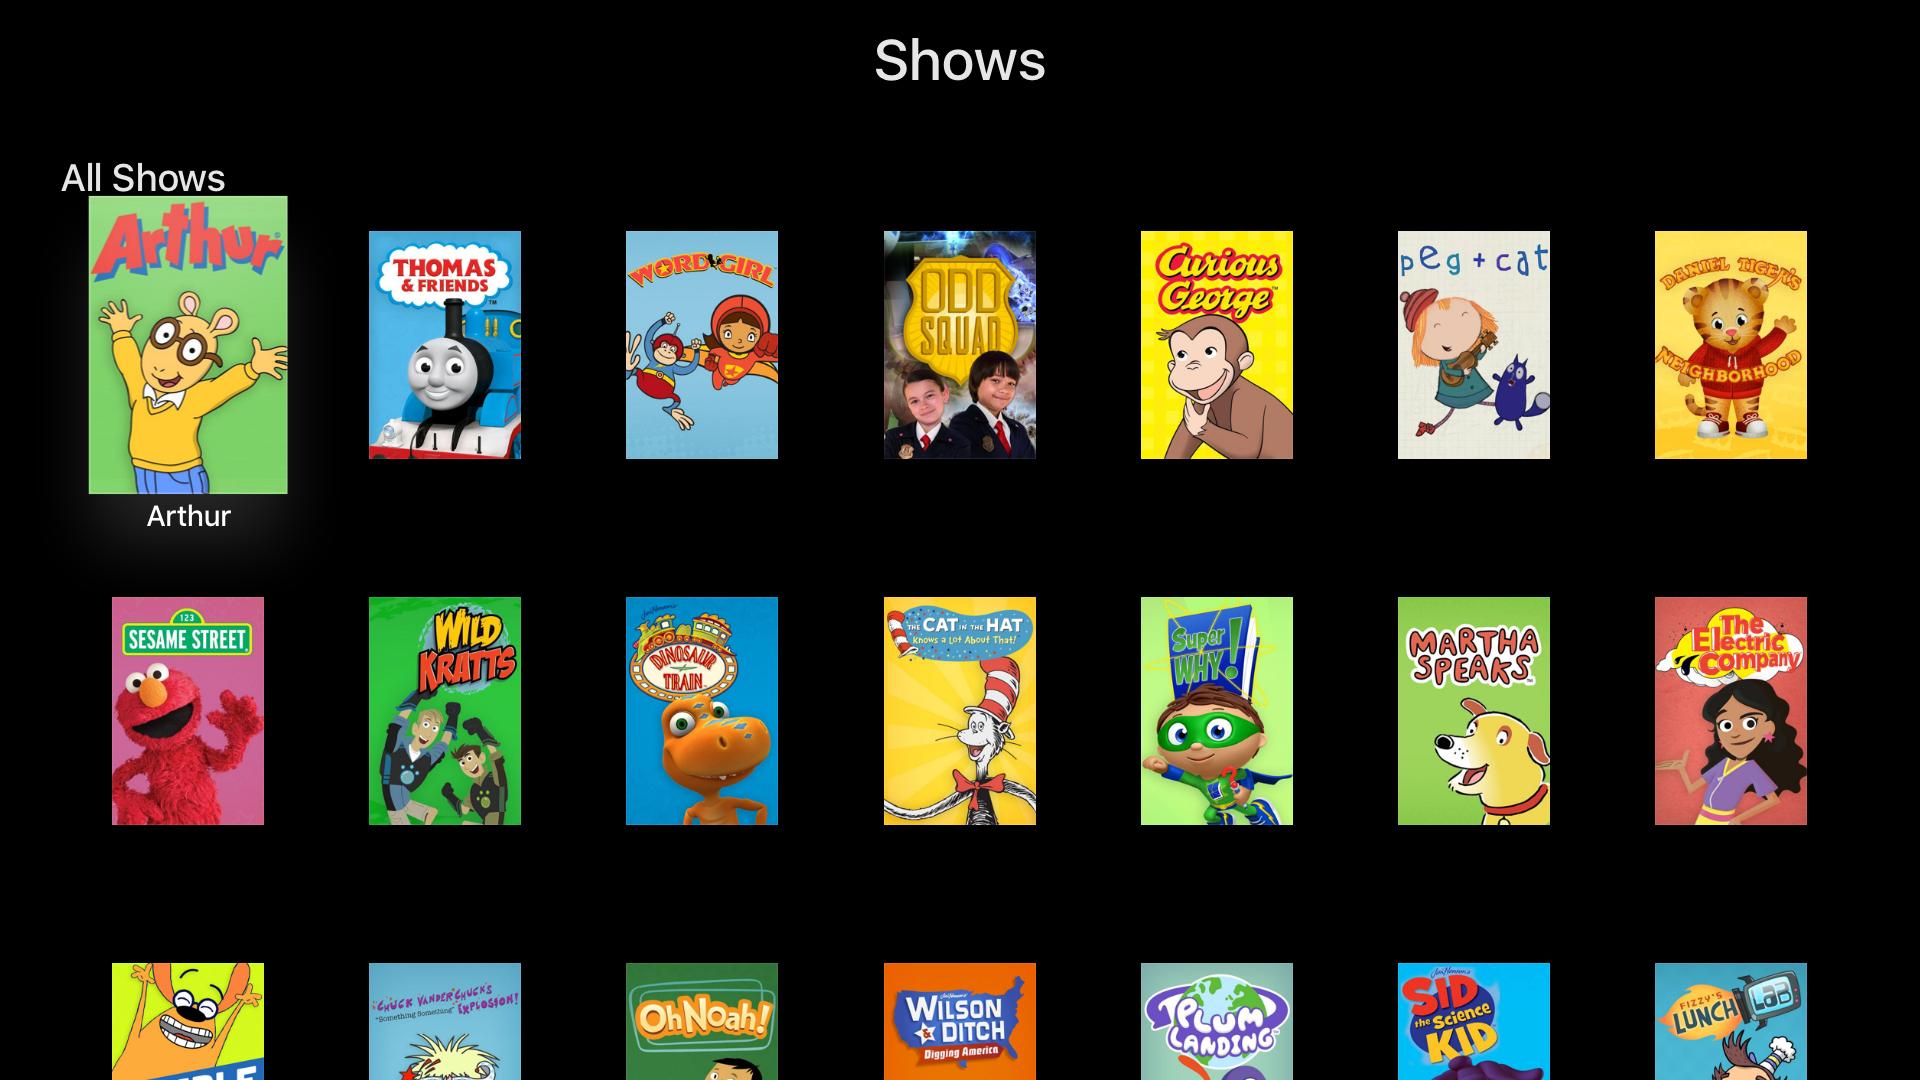 PBS KIDS Video Apps 148Apps Pbs kids videos, Pbs